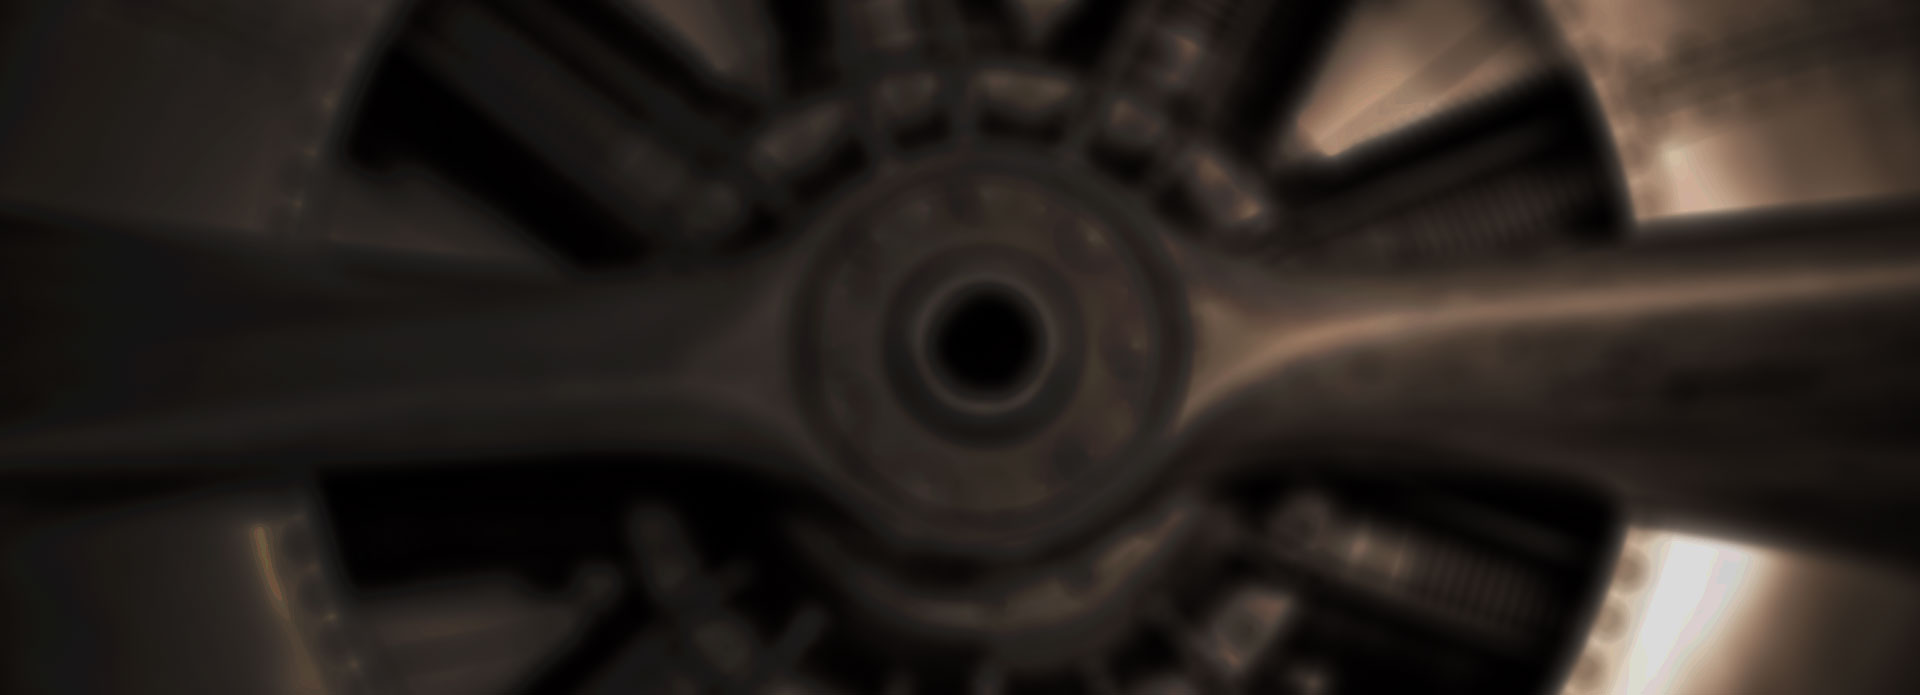 Horizontal-Turning-Center